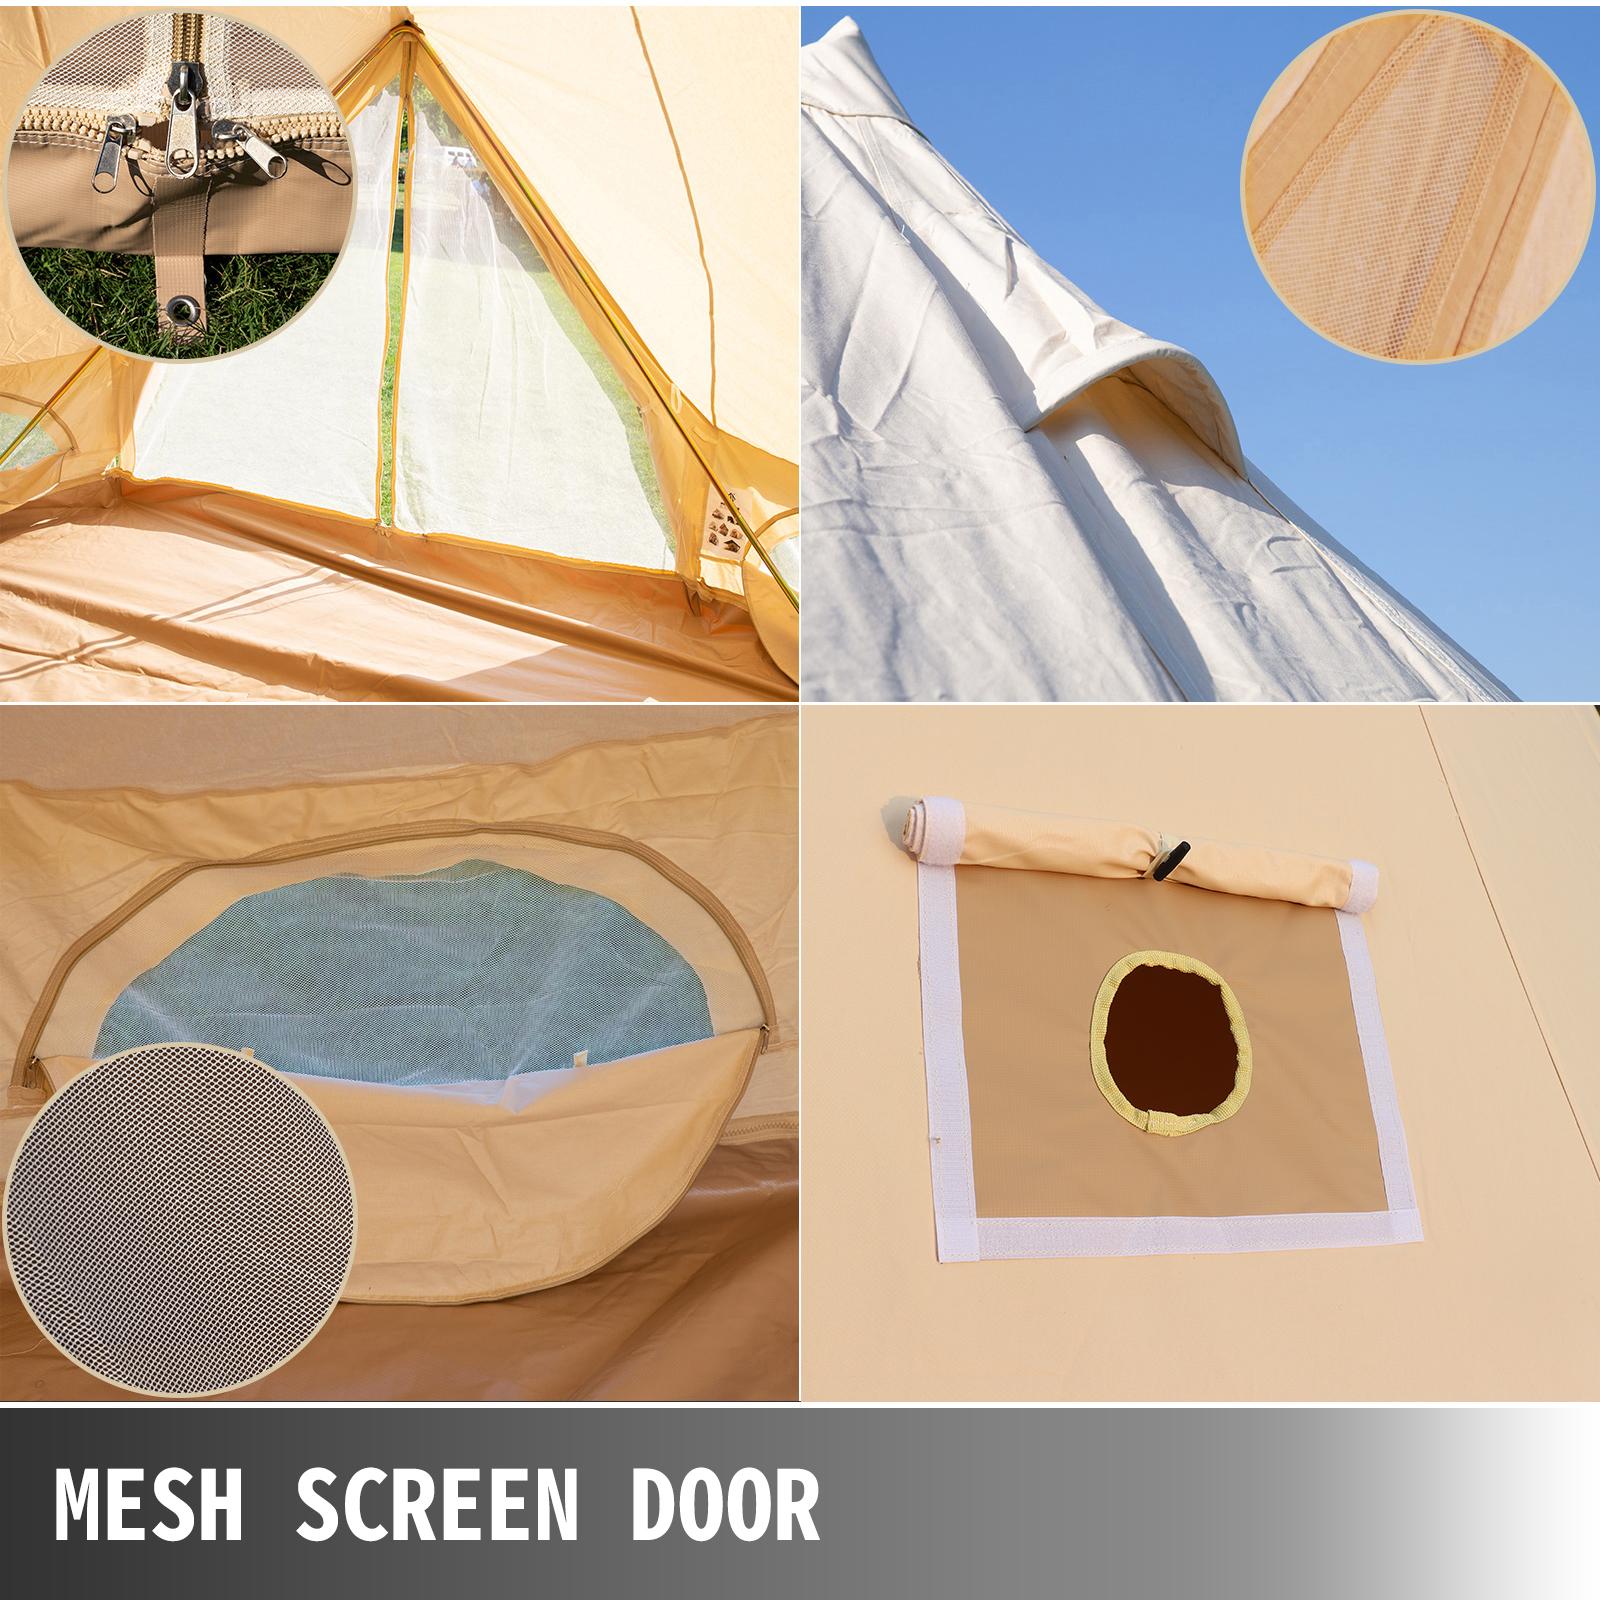 4-Season-Bell-Tent-3-4-5-6M-Waterproof-Cotton-Canvas-Glamping-Camping-Beach-US thumbnail 51